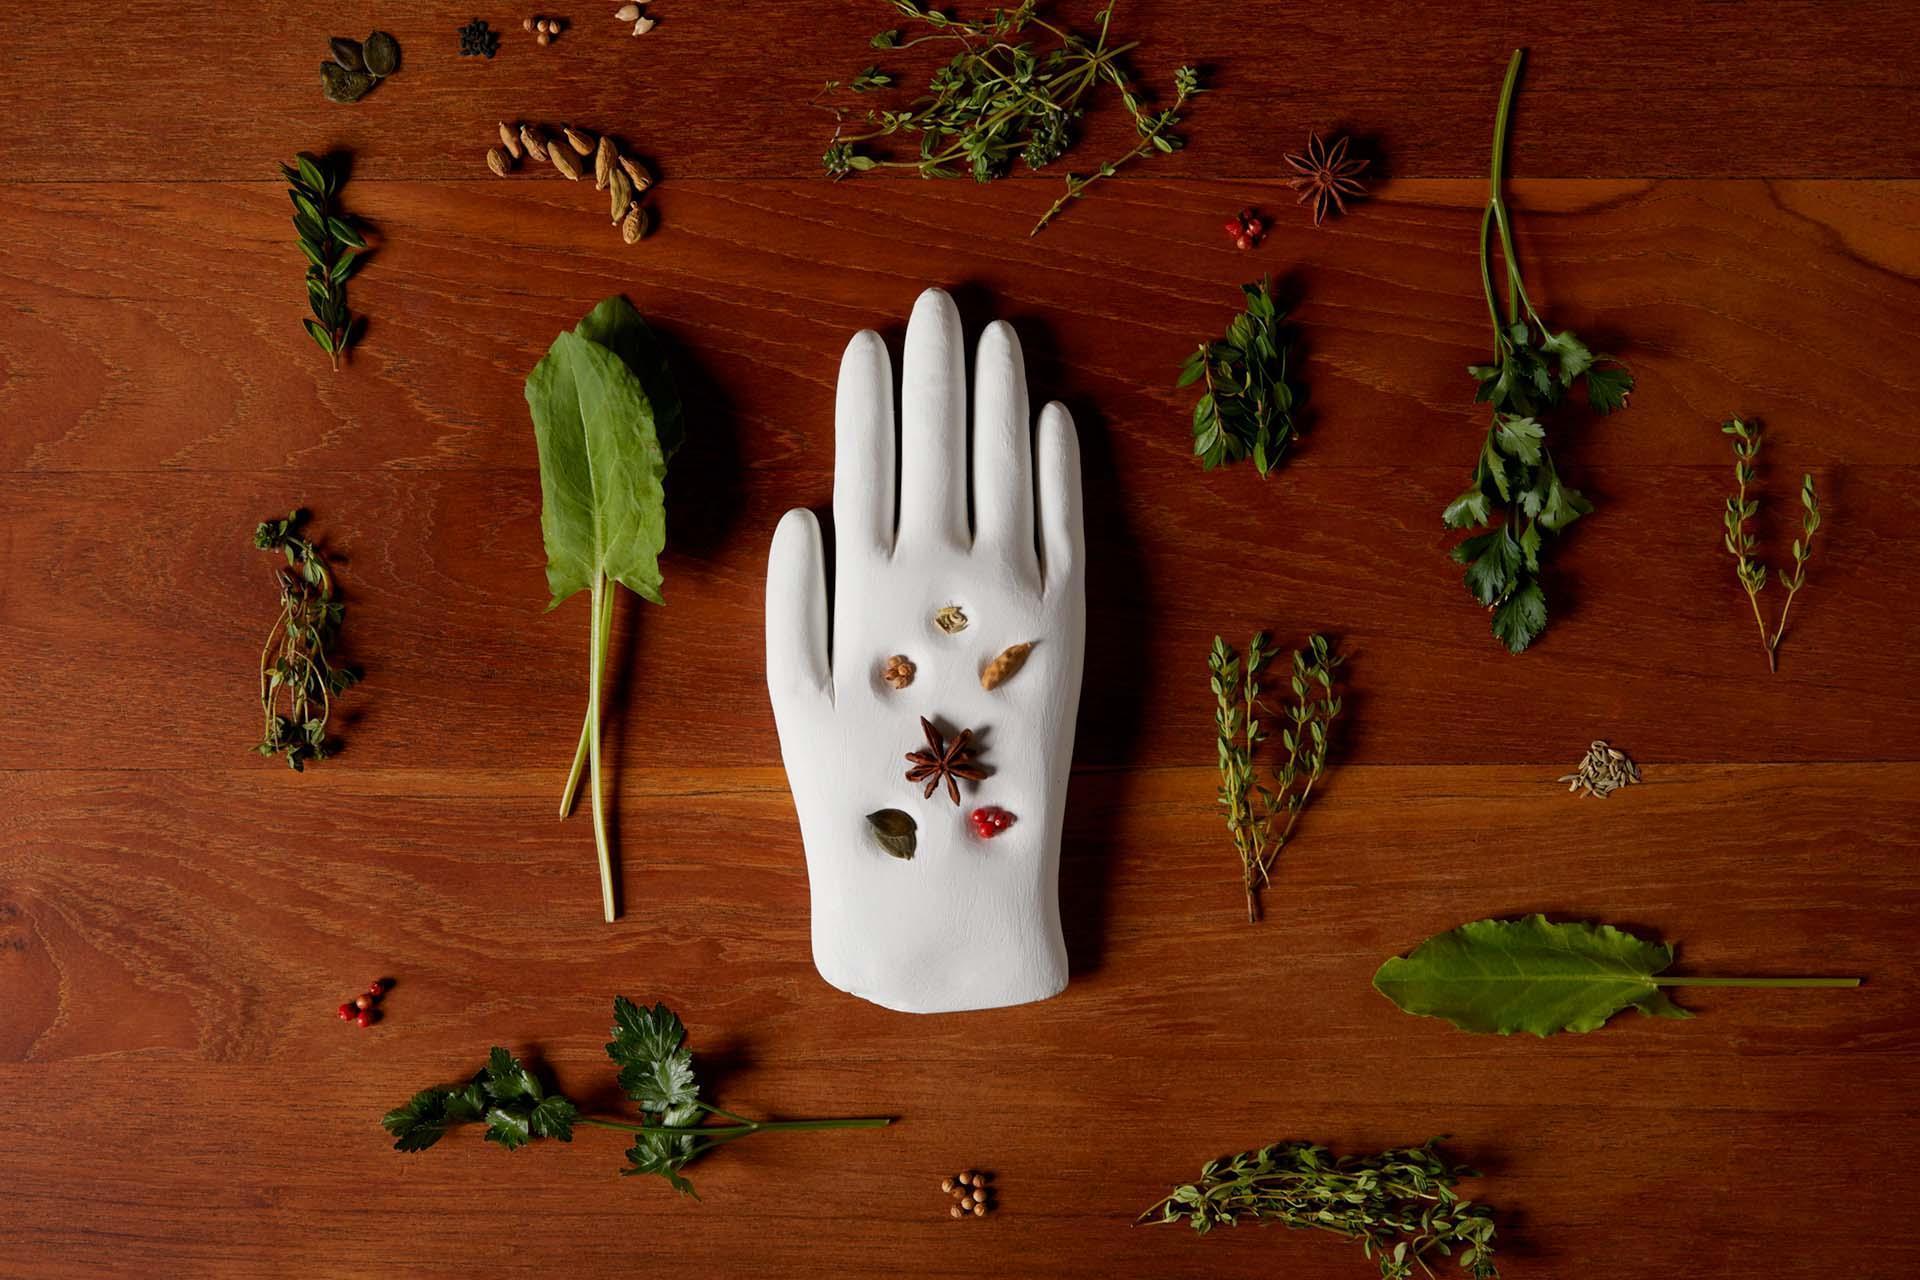 HAND OF THE FARMER